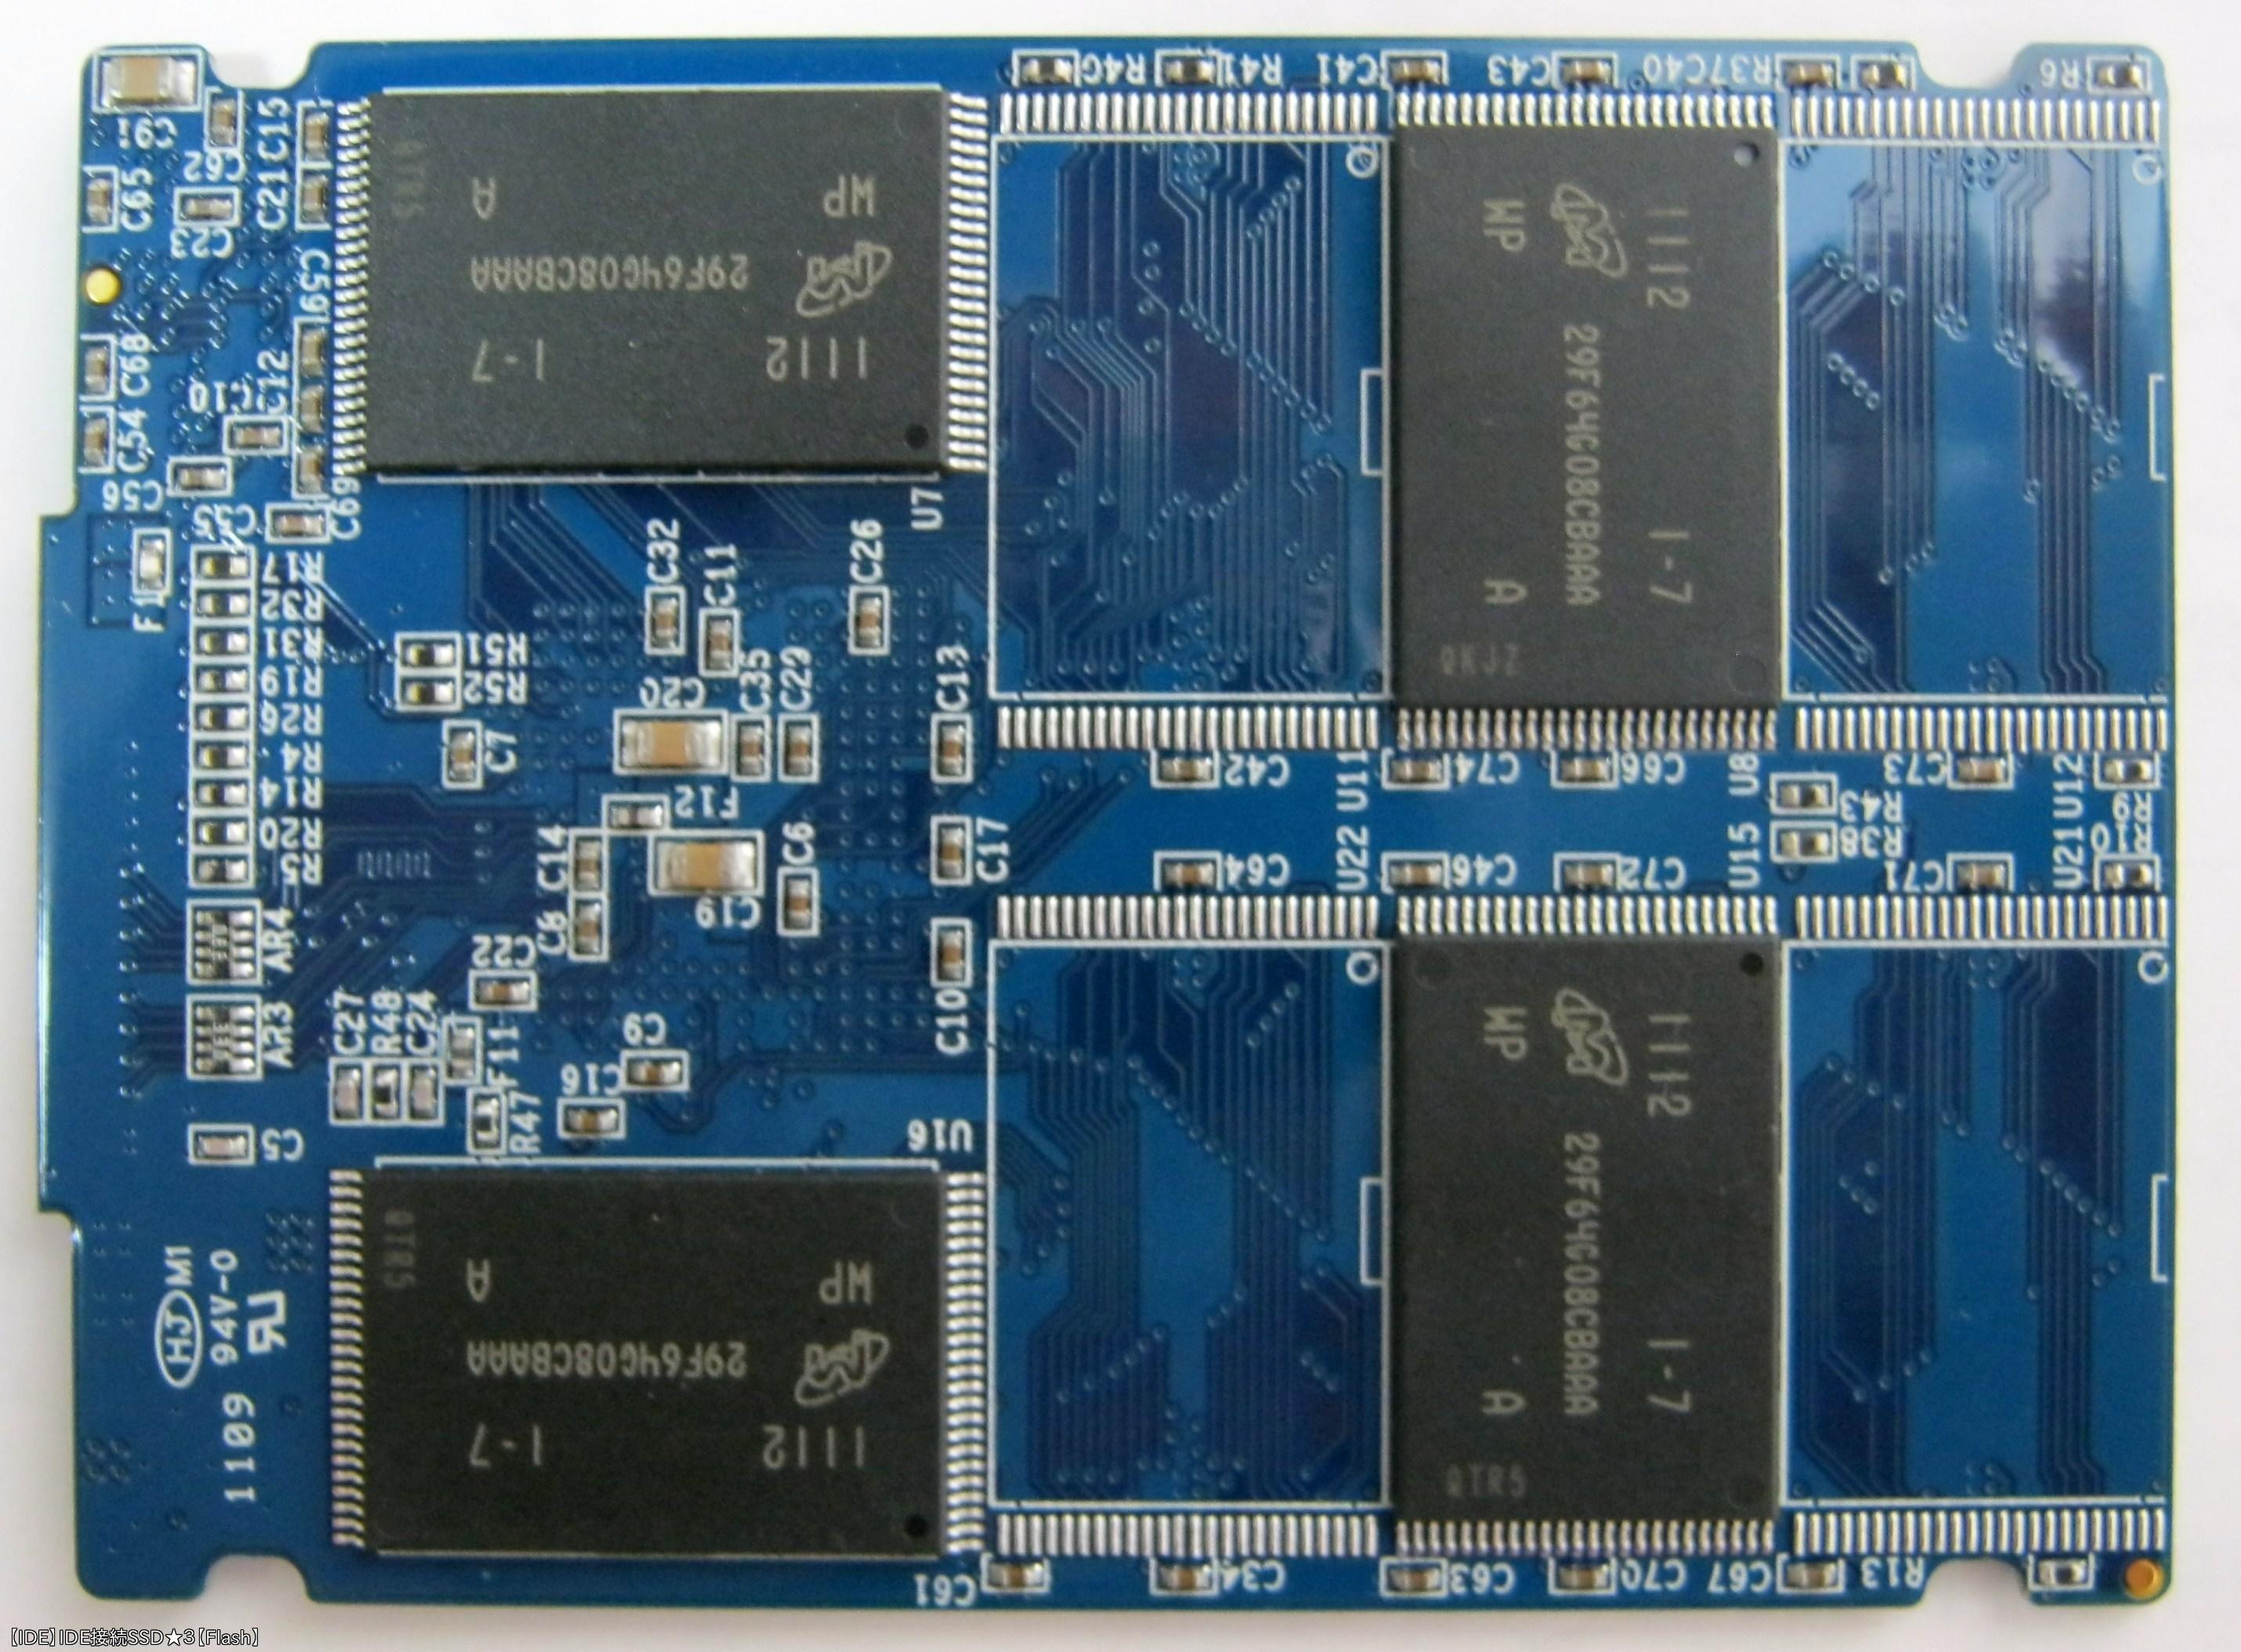 SSD・ゼロスピ化・ストライピング 8台目->画像>59枚